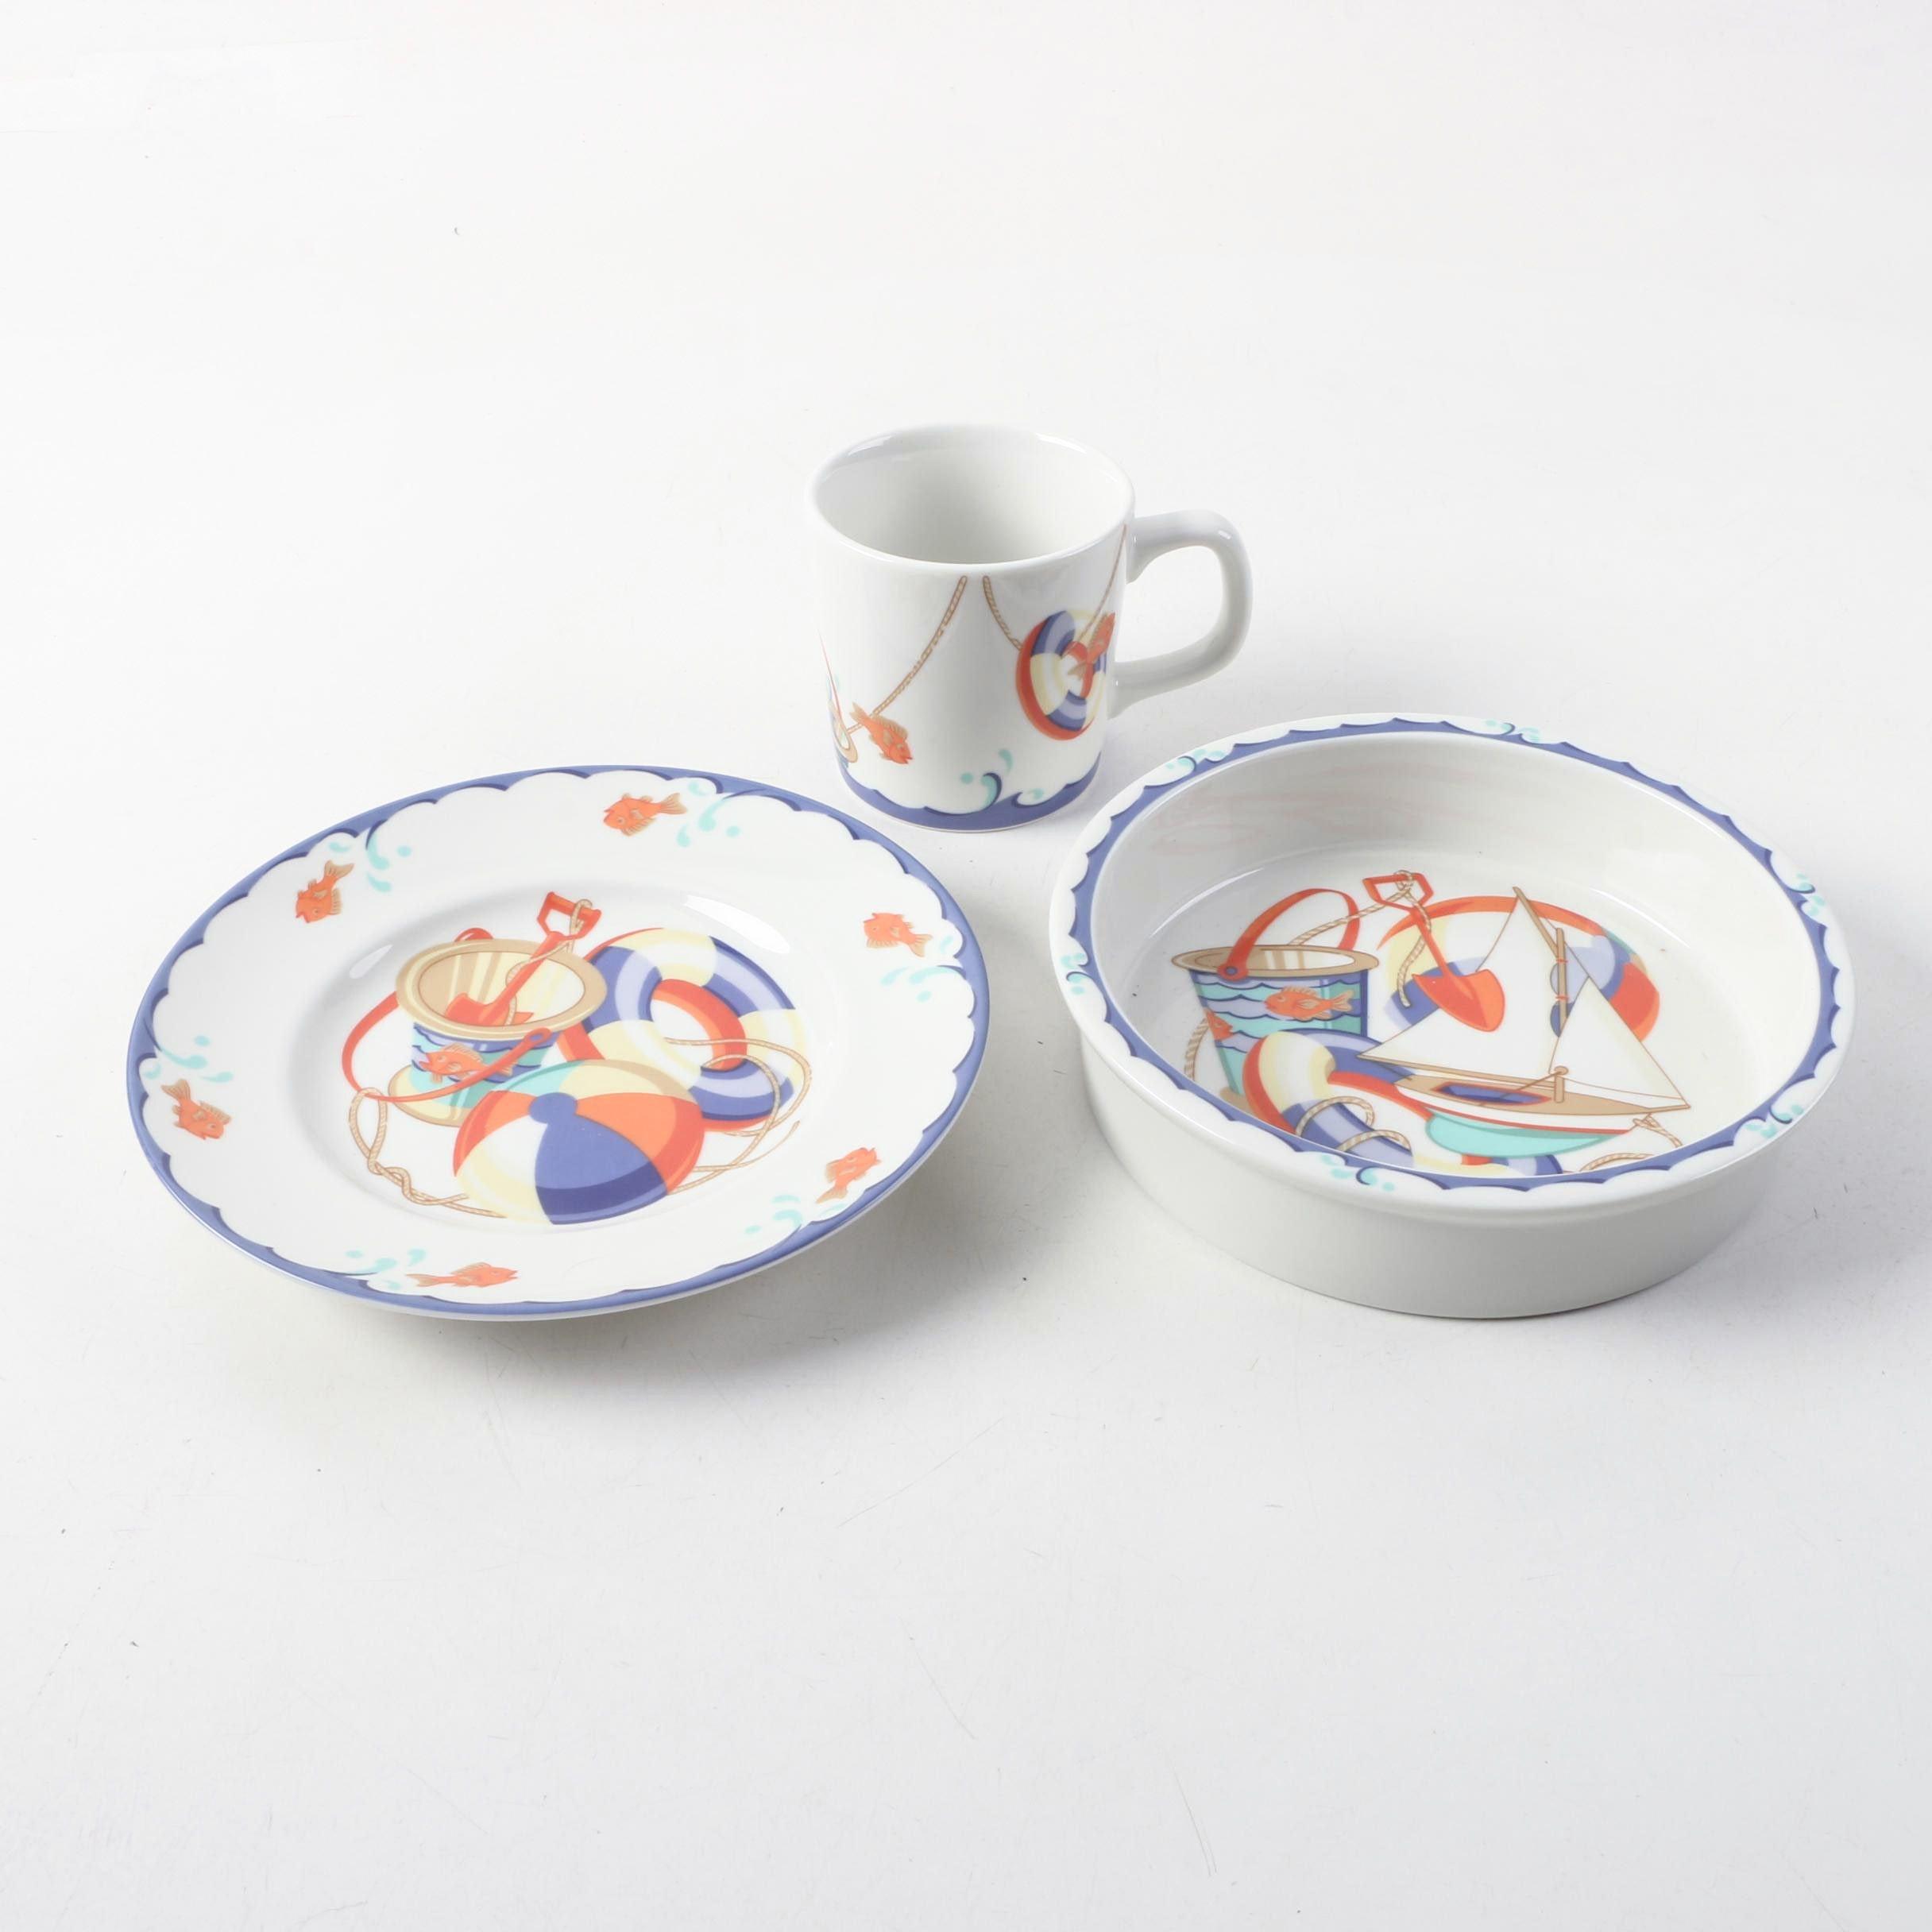 "Tiffany & Co. ""Tiffany Seashore"" Plate, Bowl and Mug"